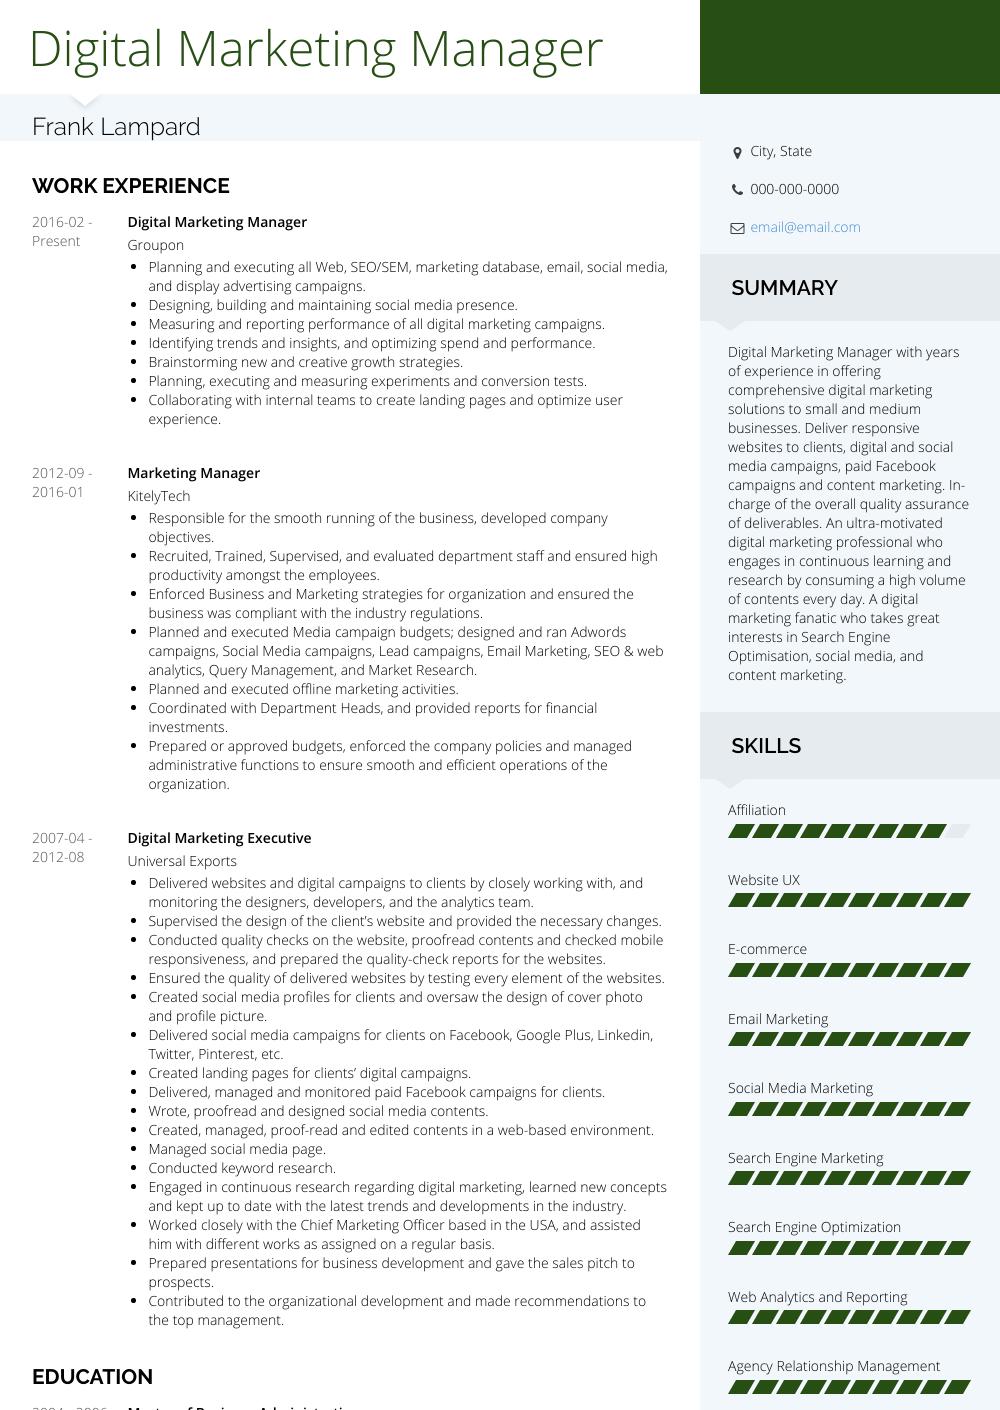 Digital Marketing Resume Samples and Templates